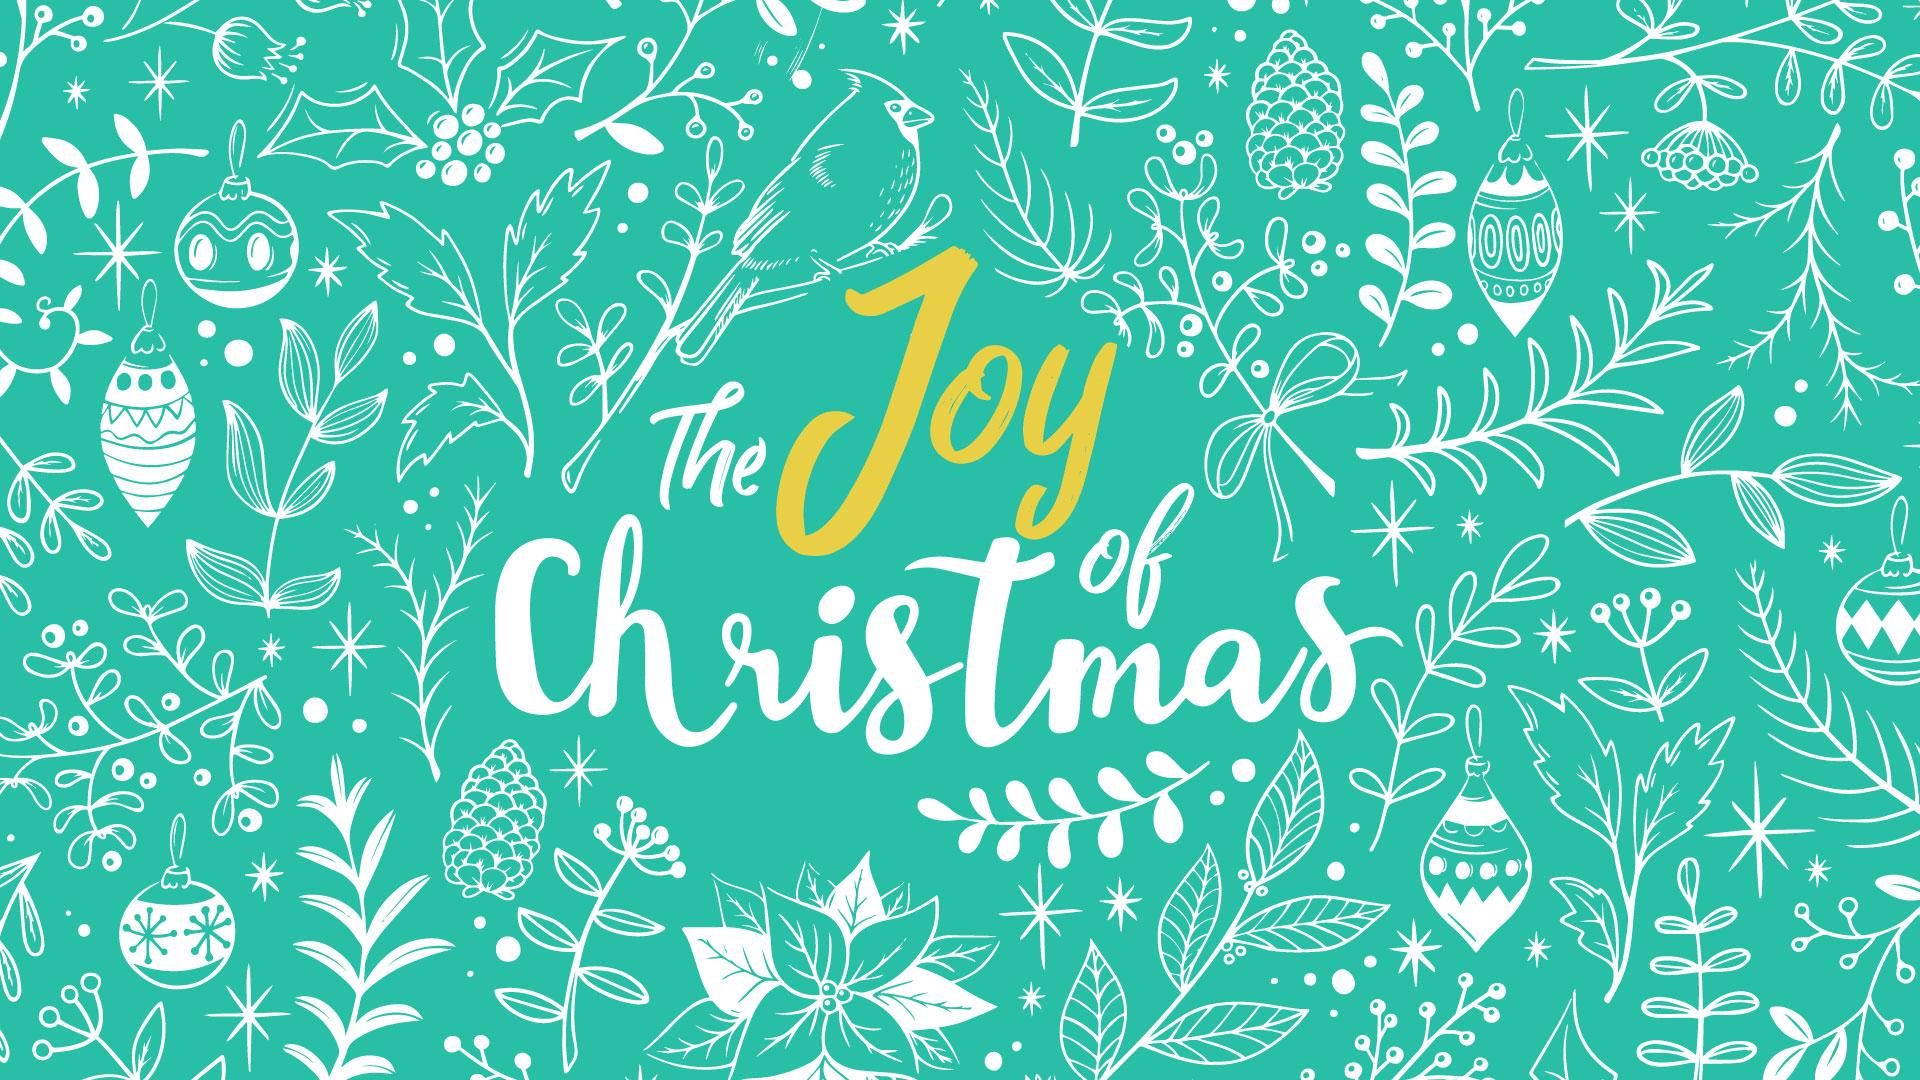 The-Joy-of-Christmas.VideoWall.jpg